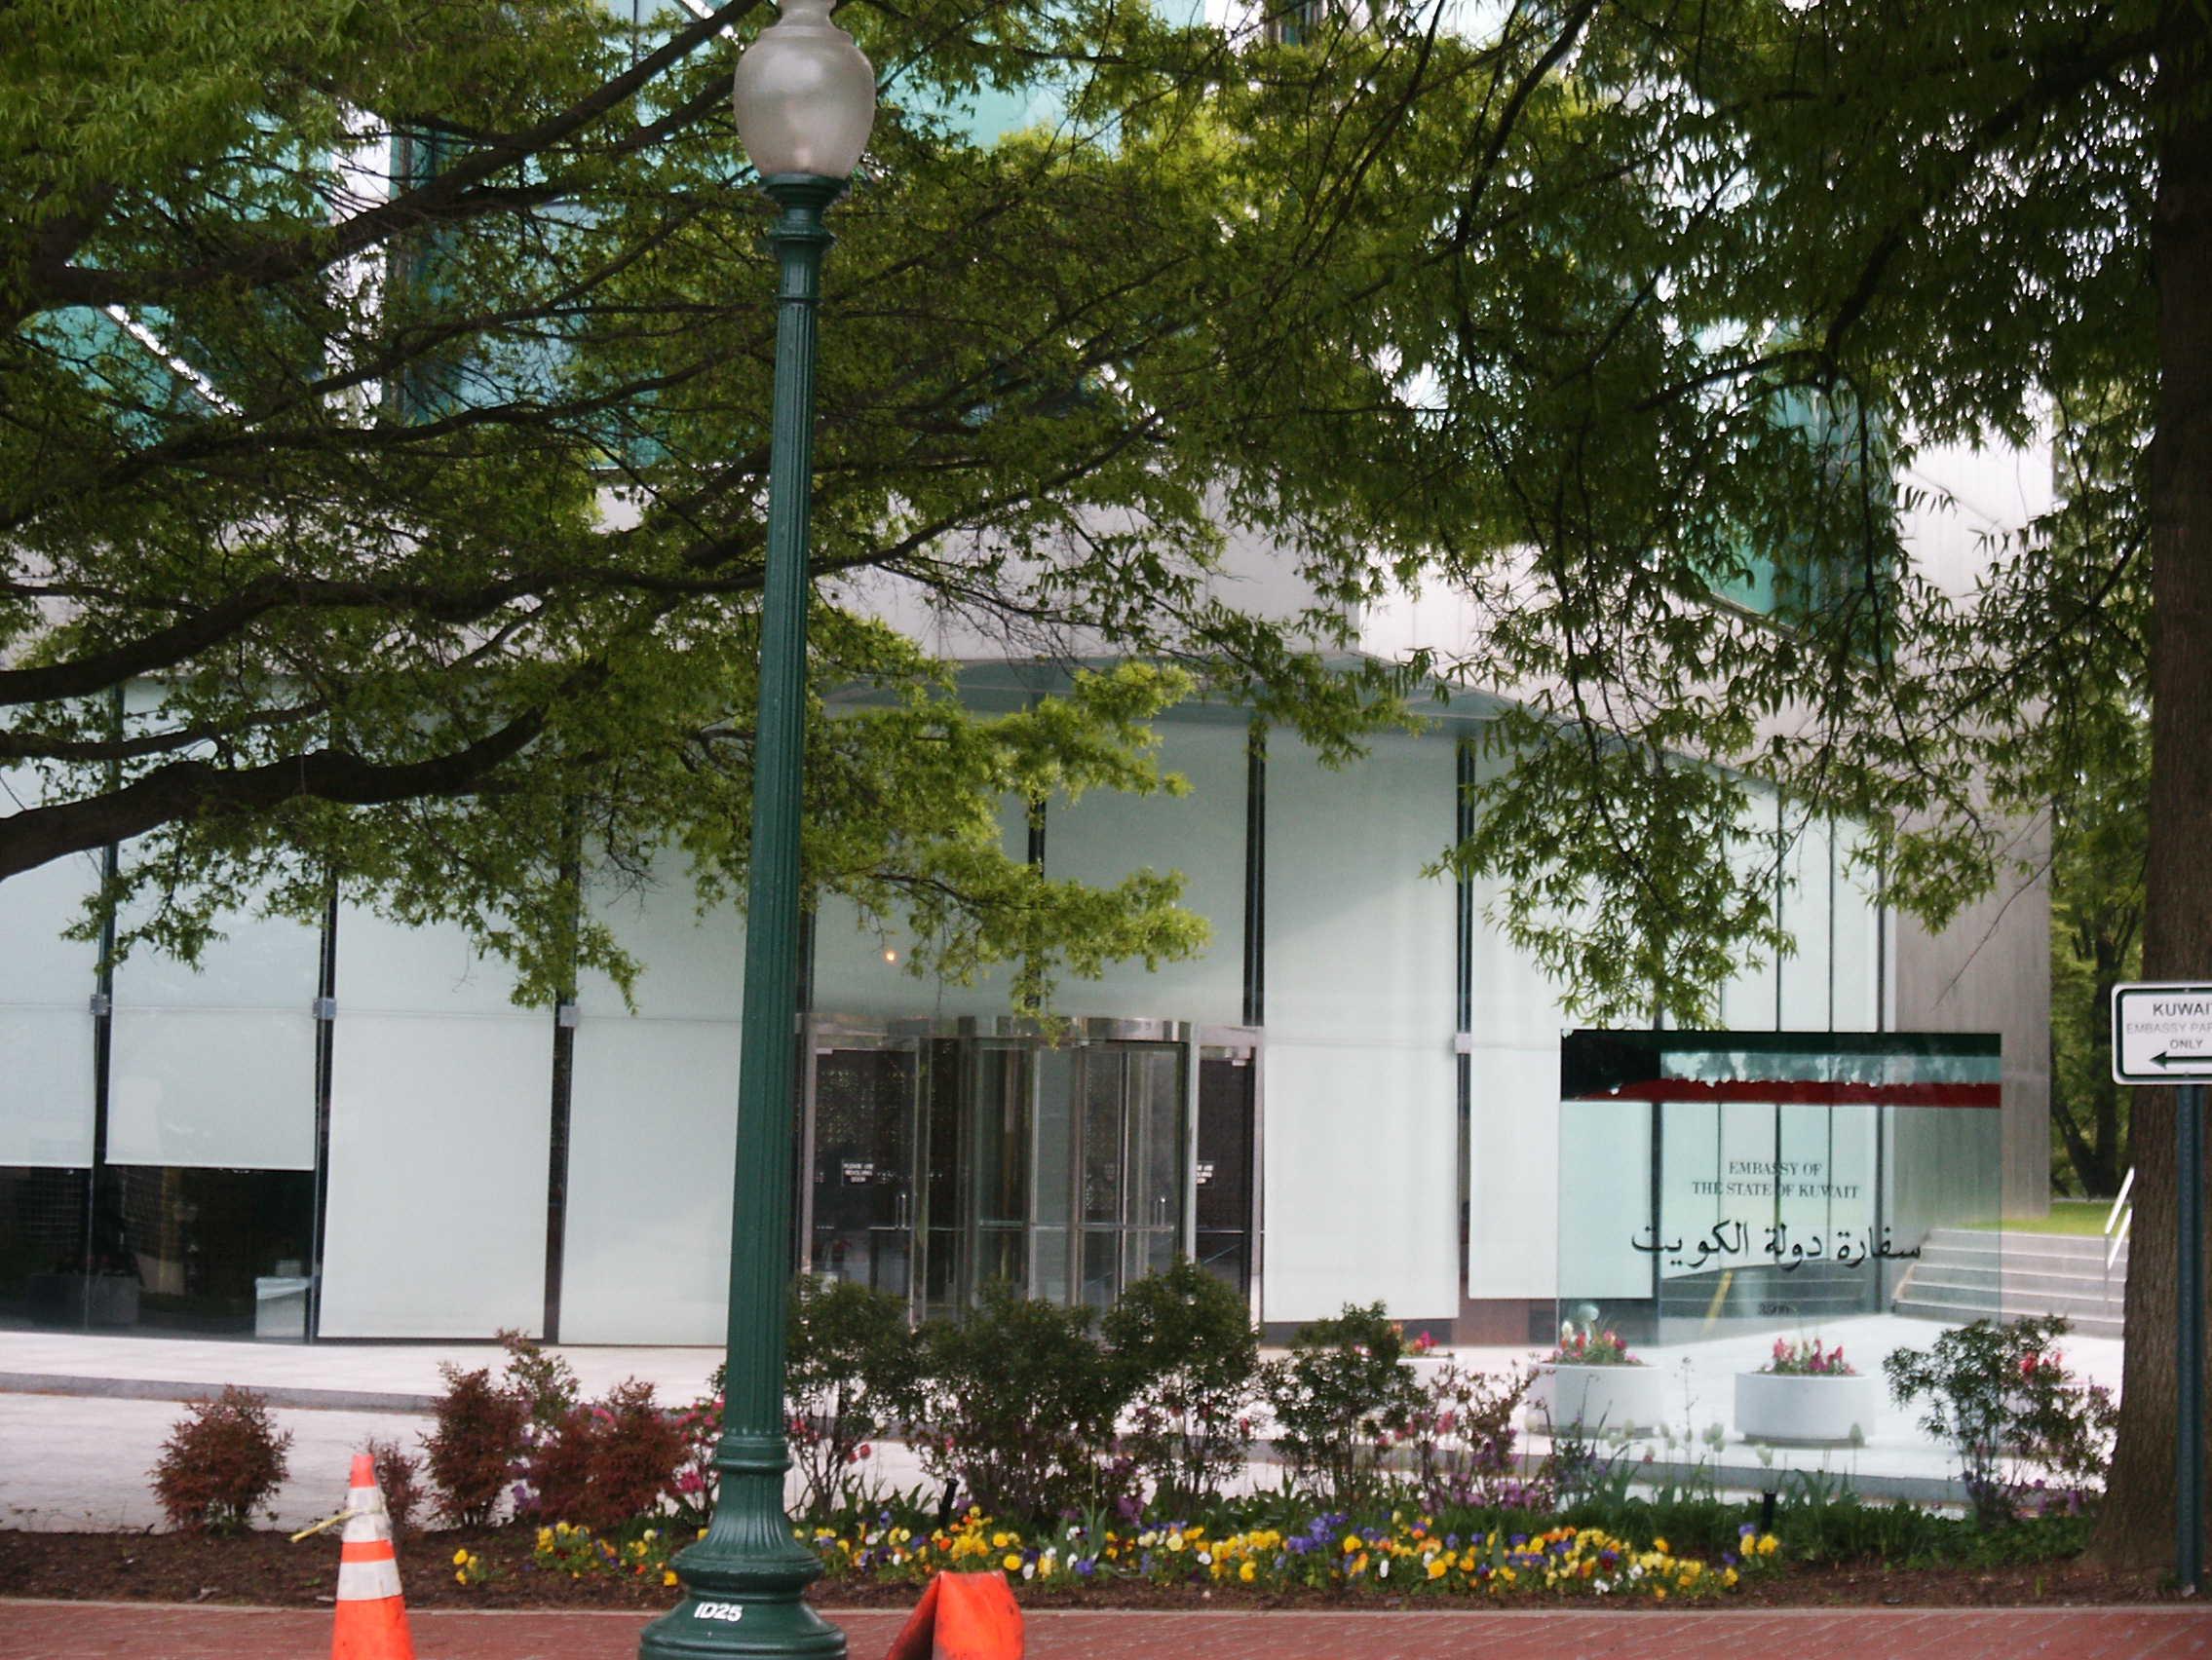 Embassy of Kuwait in Washington, D C  - Wikipedia